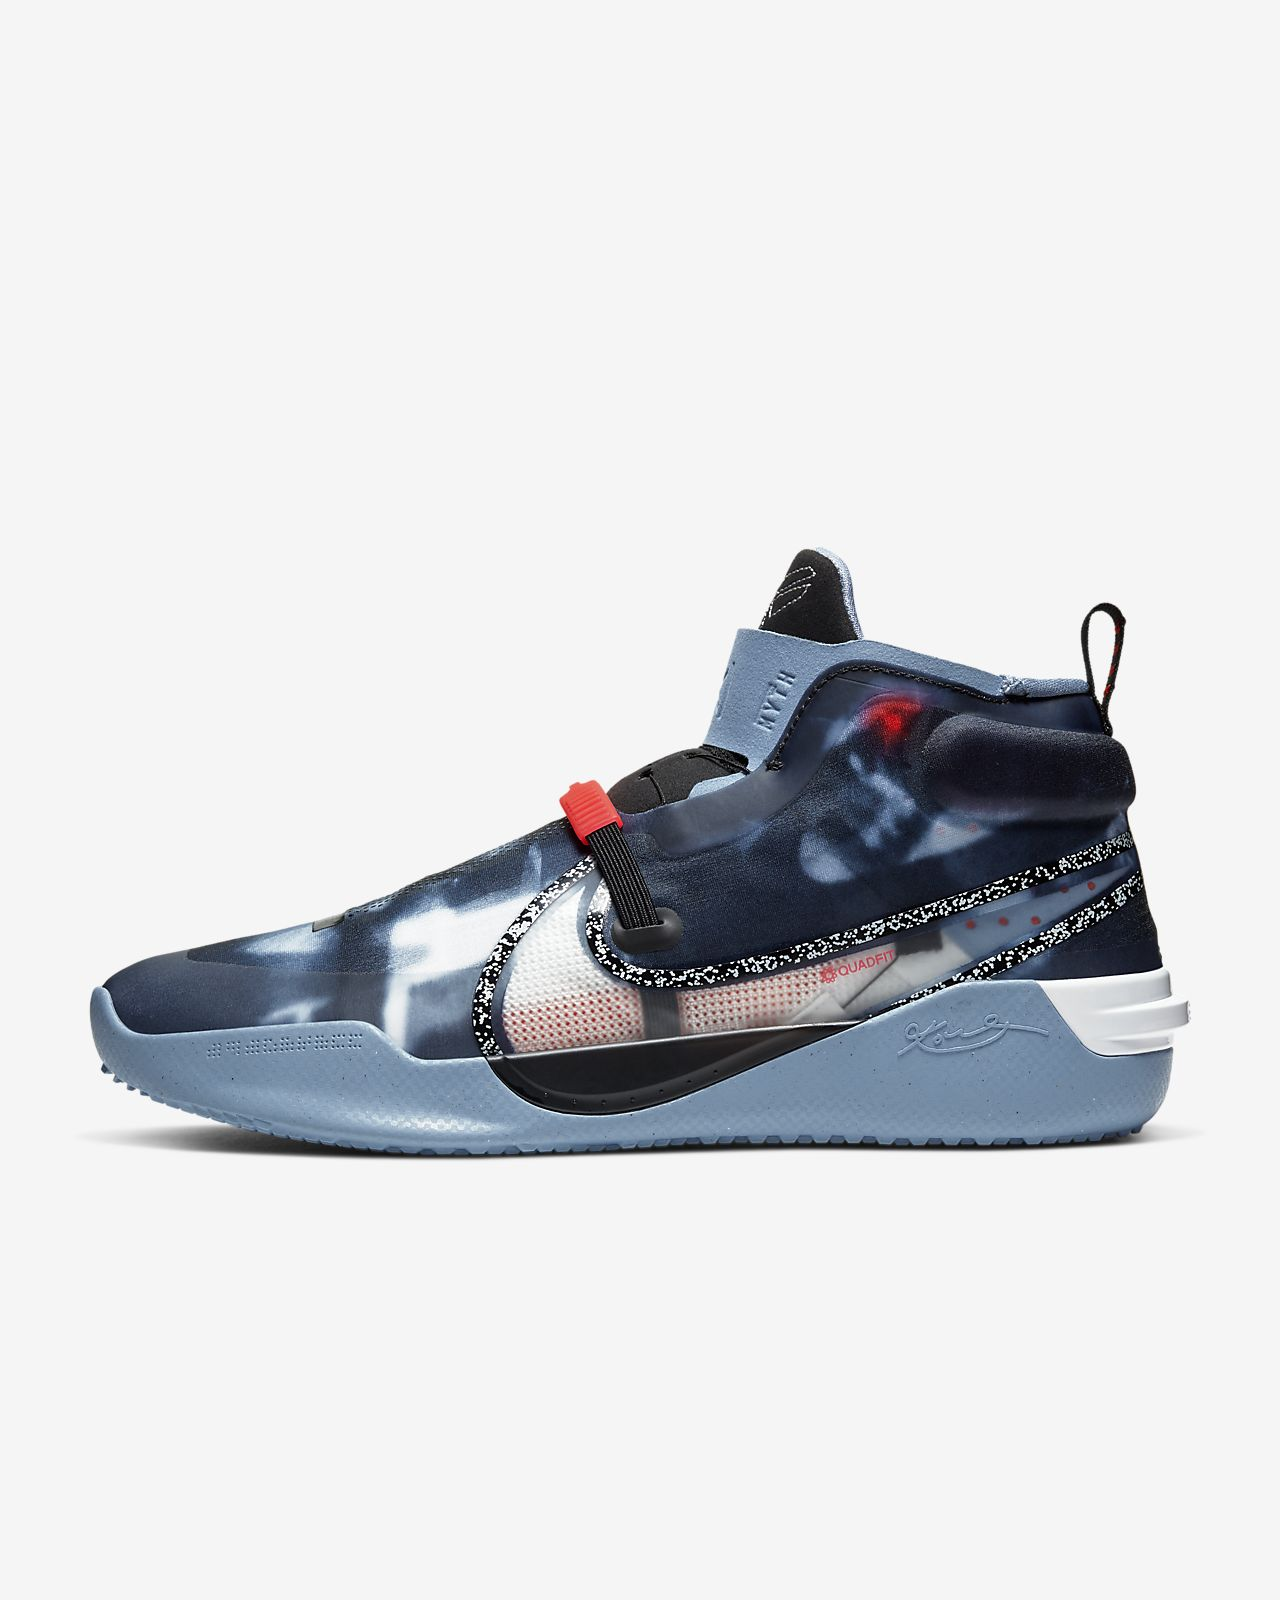 Kobe AD NXT Basketball Shoe